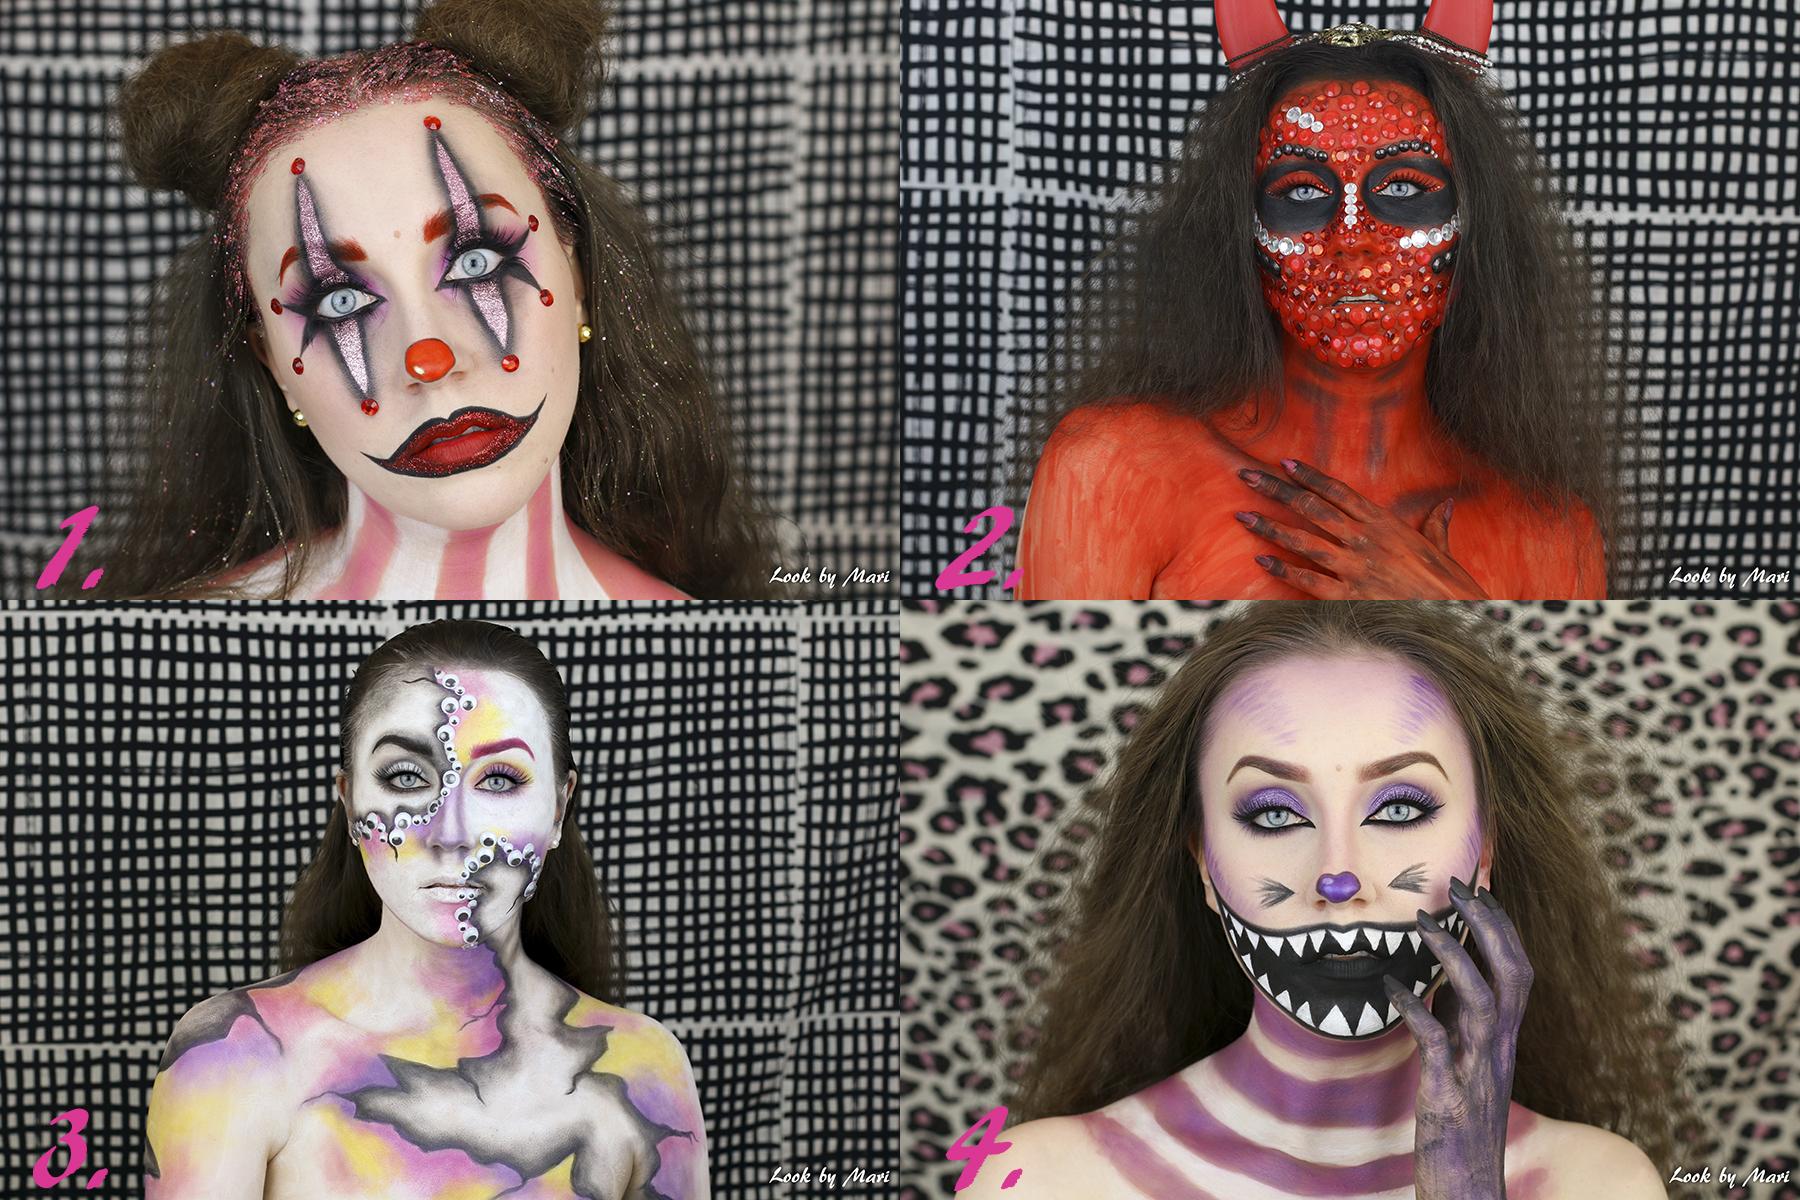 1 halloween makeup ideas 2017 costume glittery beautiful devil clown colorful cat